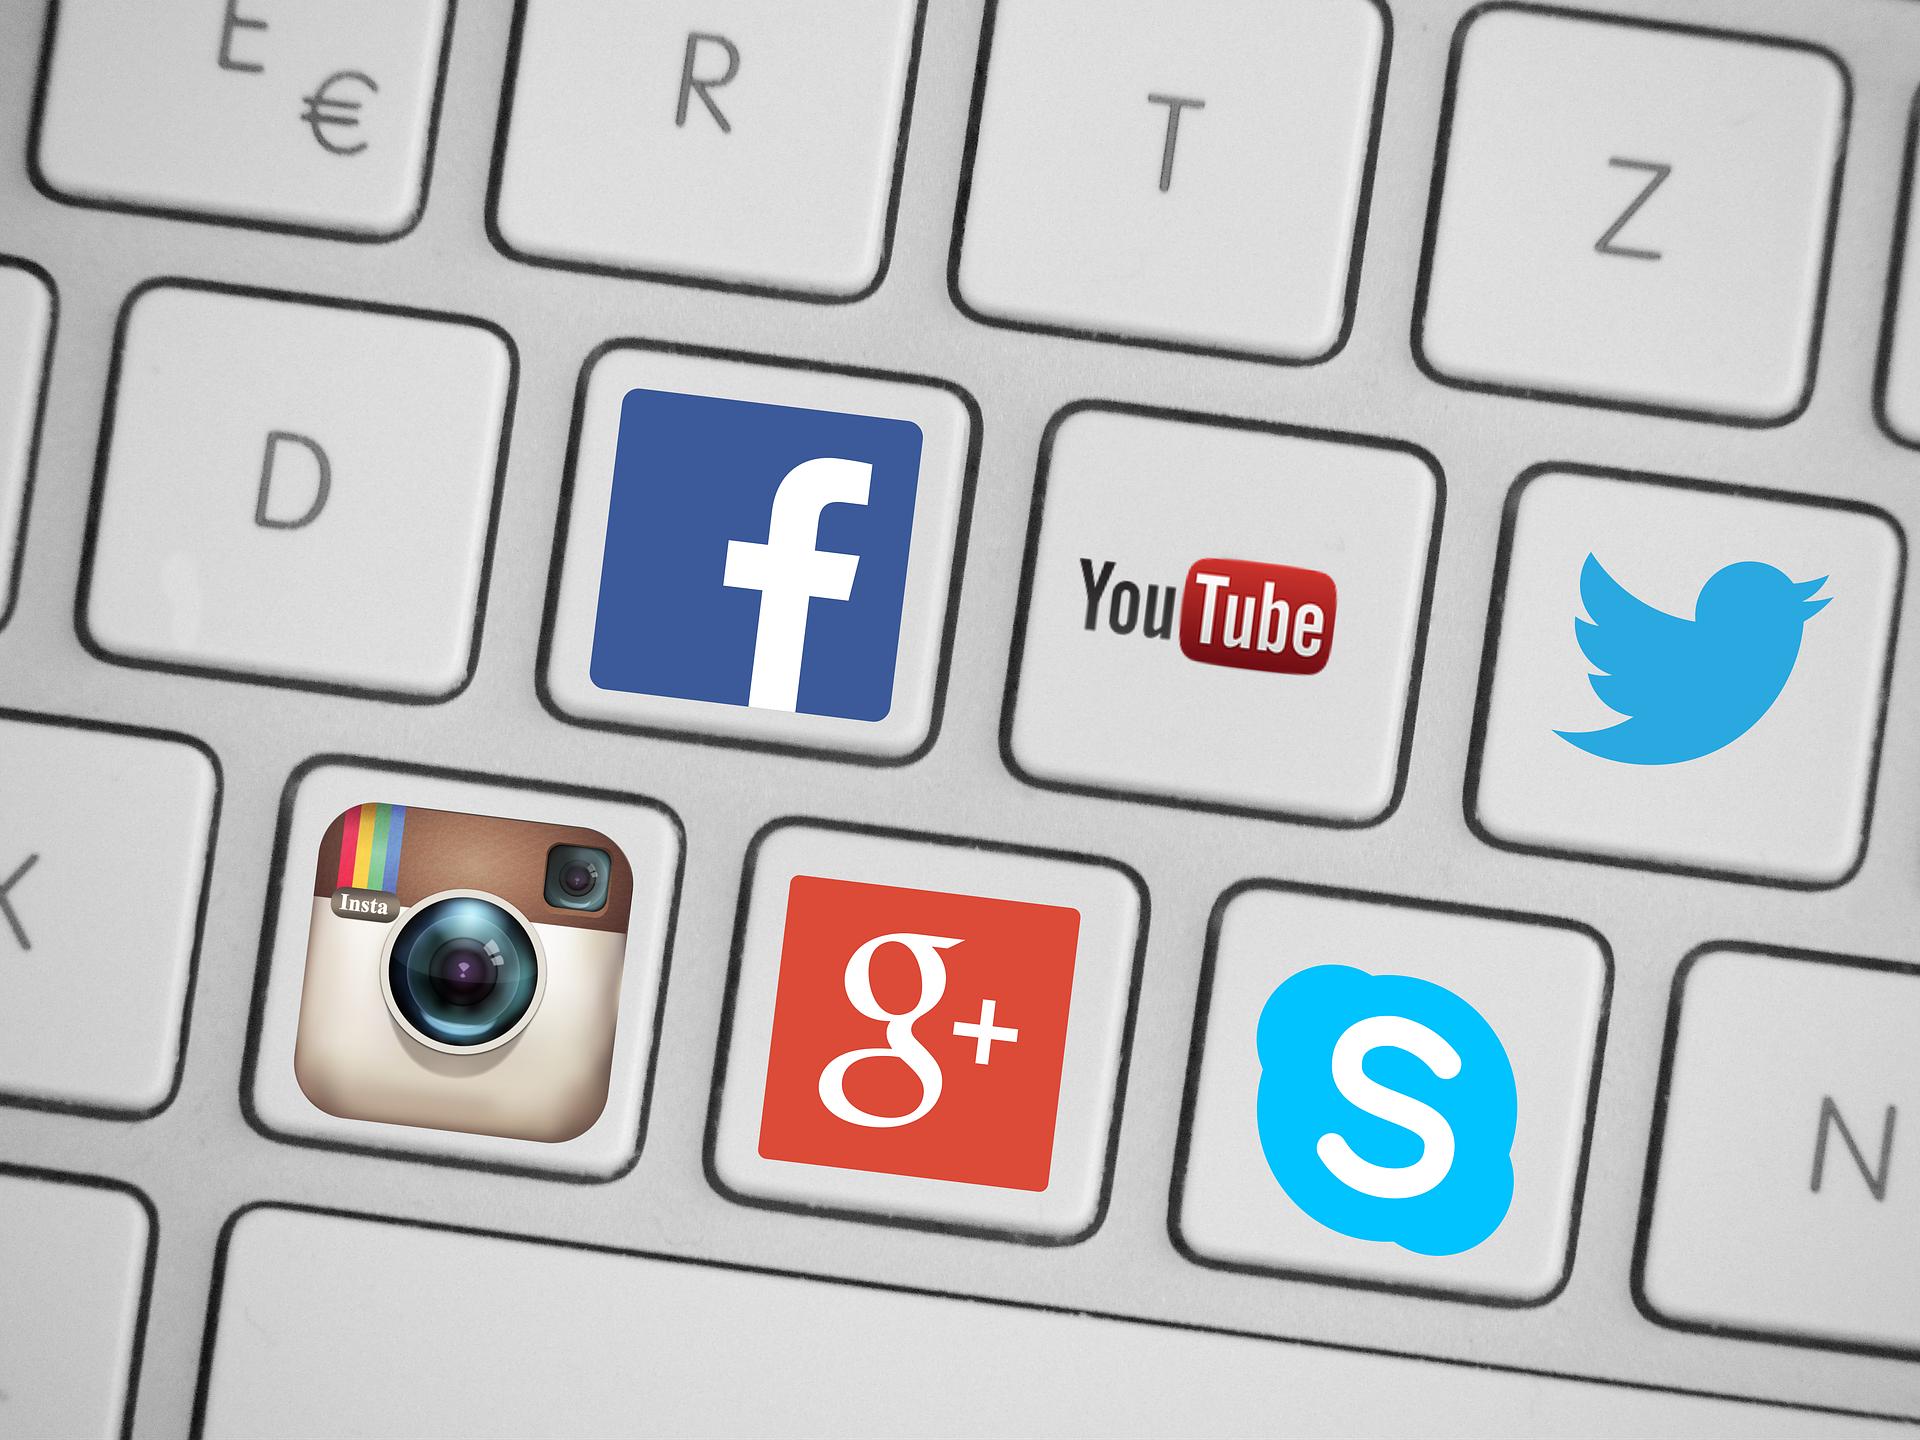 social-media-icons-facebook-twitter-google-plus-instagram